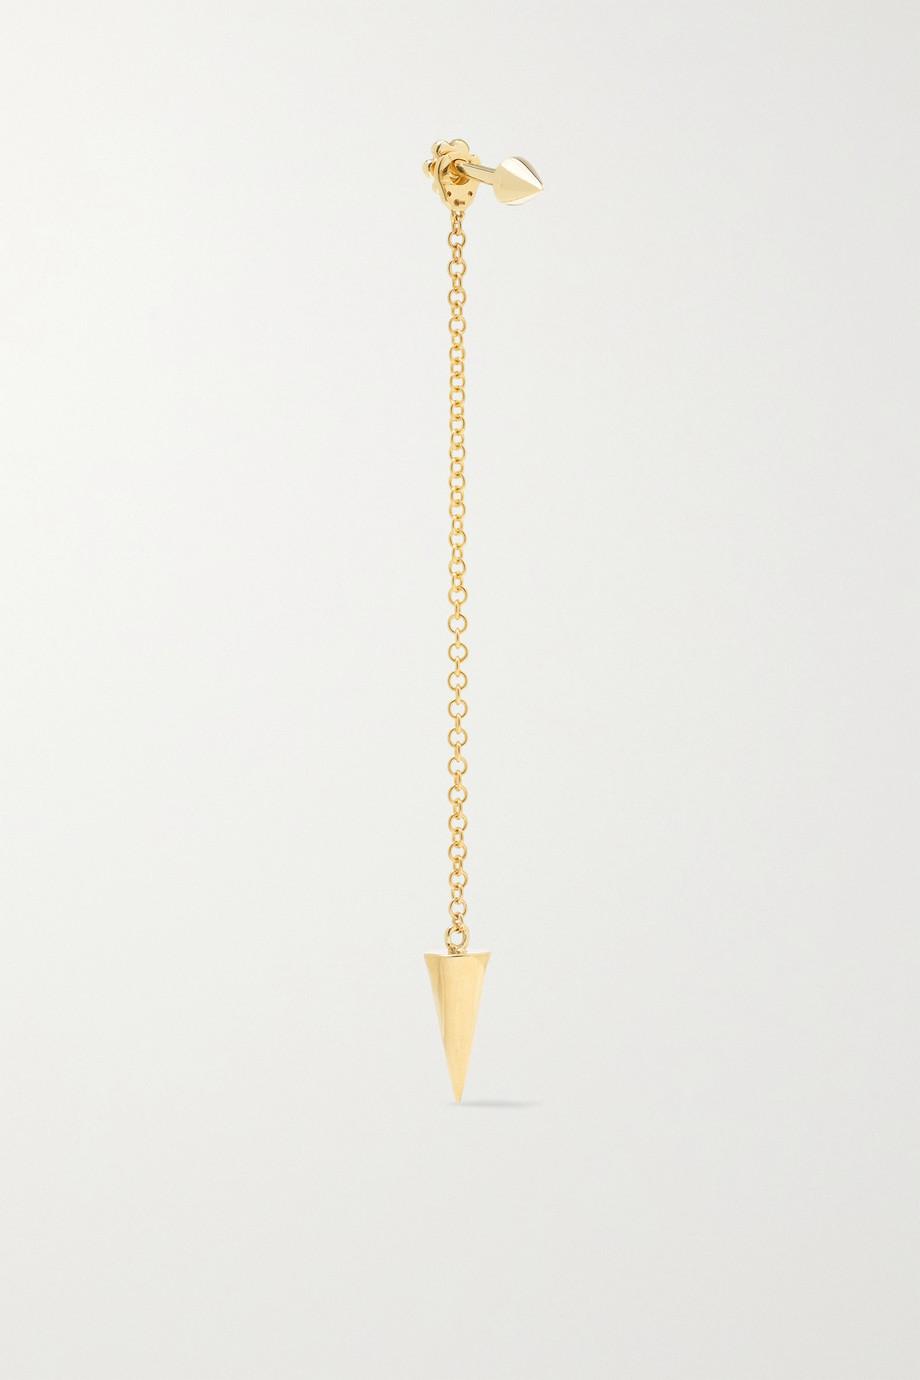 MARIA TASH 40mm Pendulum Spike 14-karat gold earring